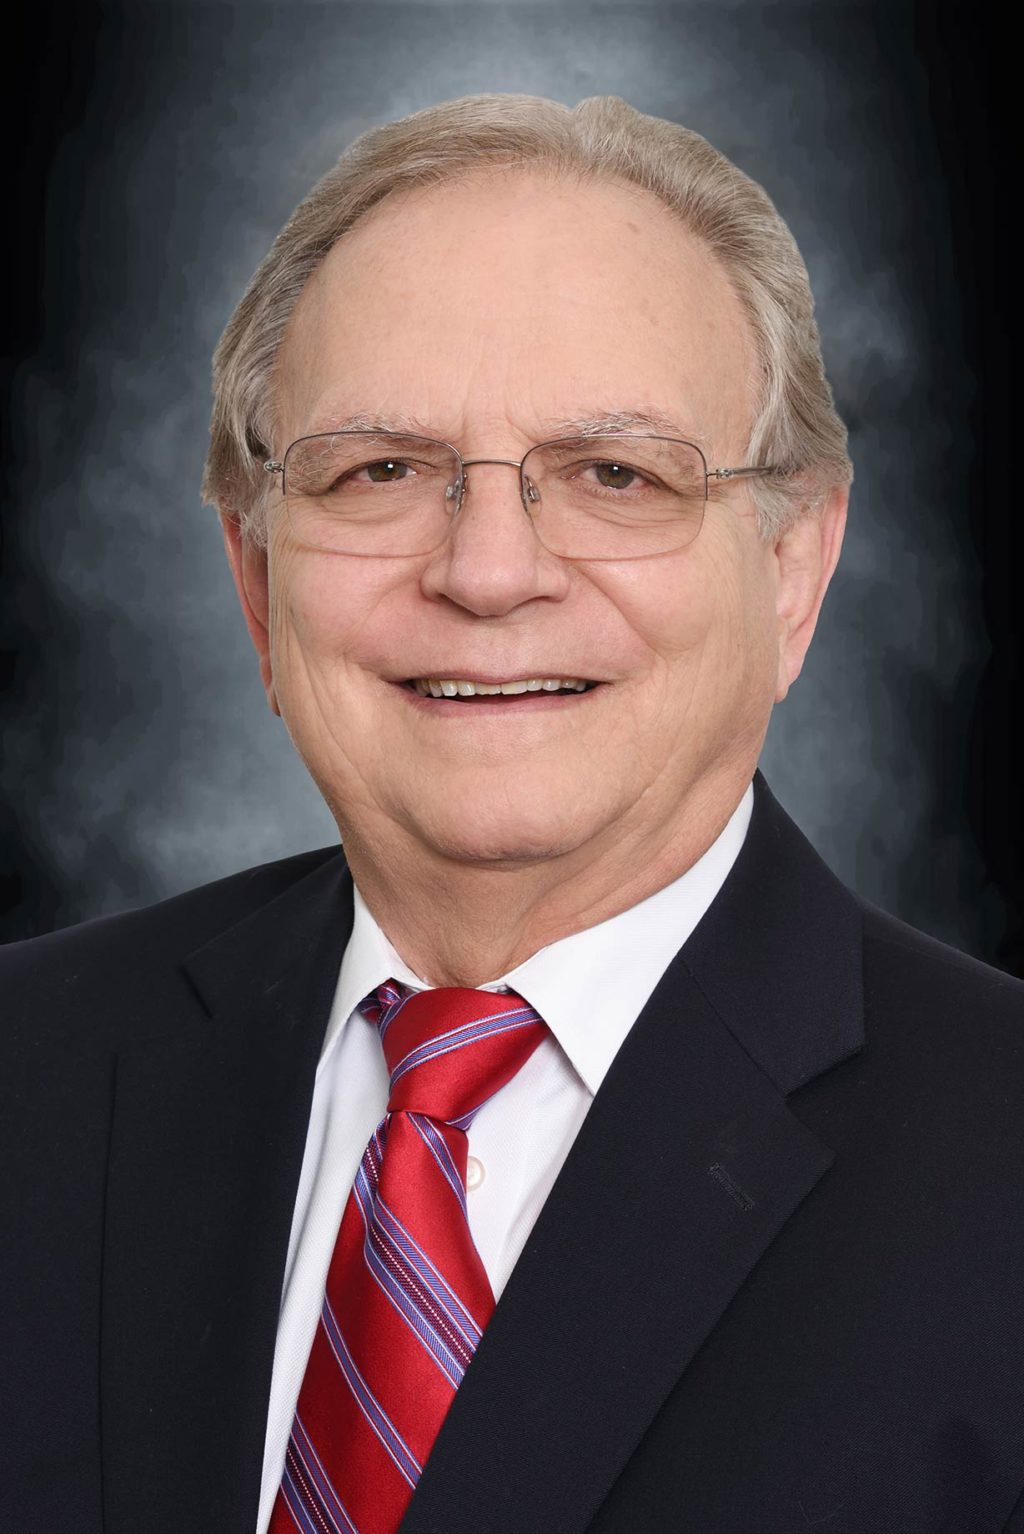 Ron Lozoff